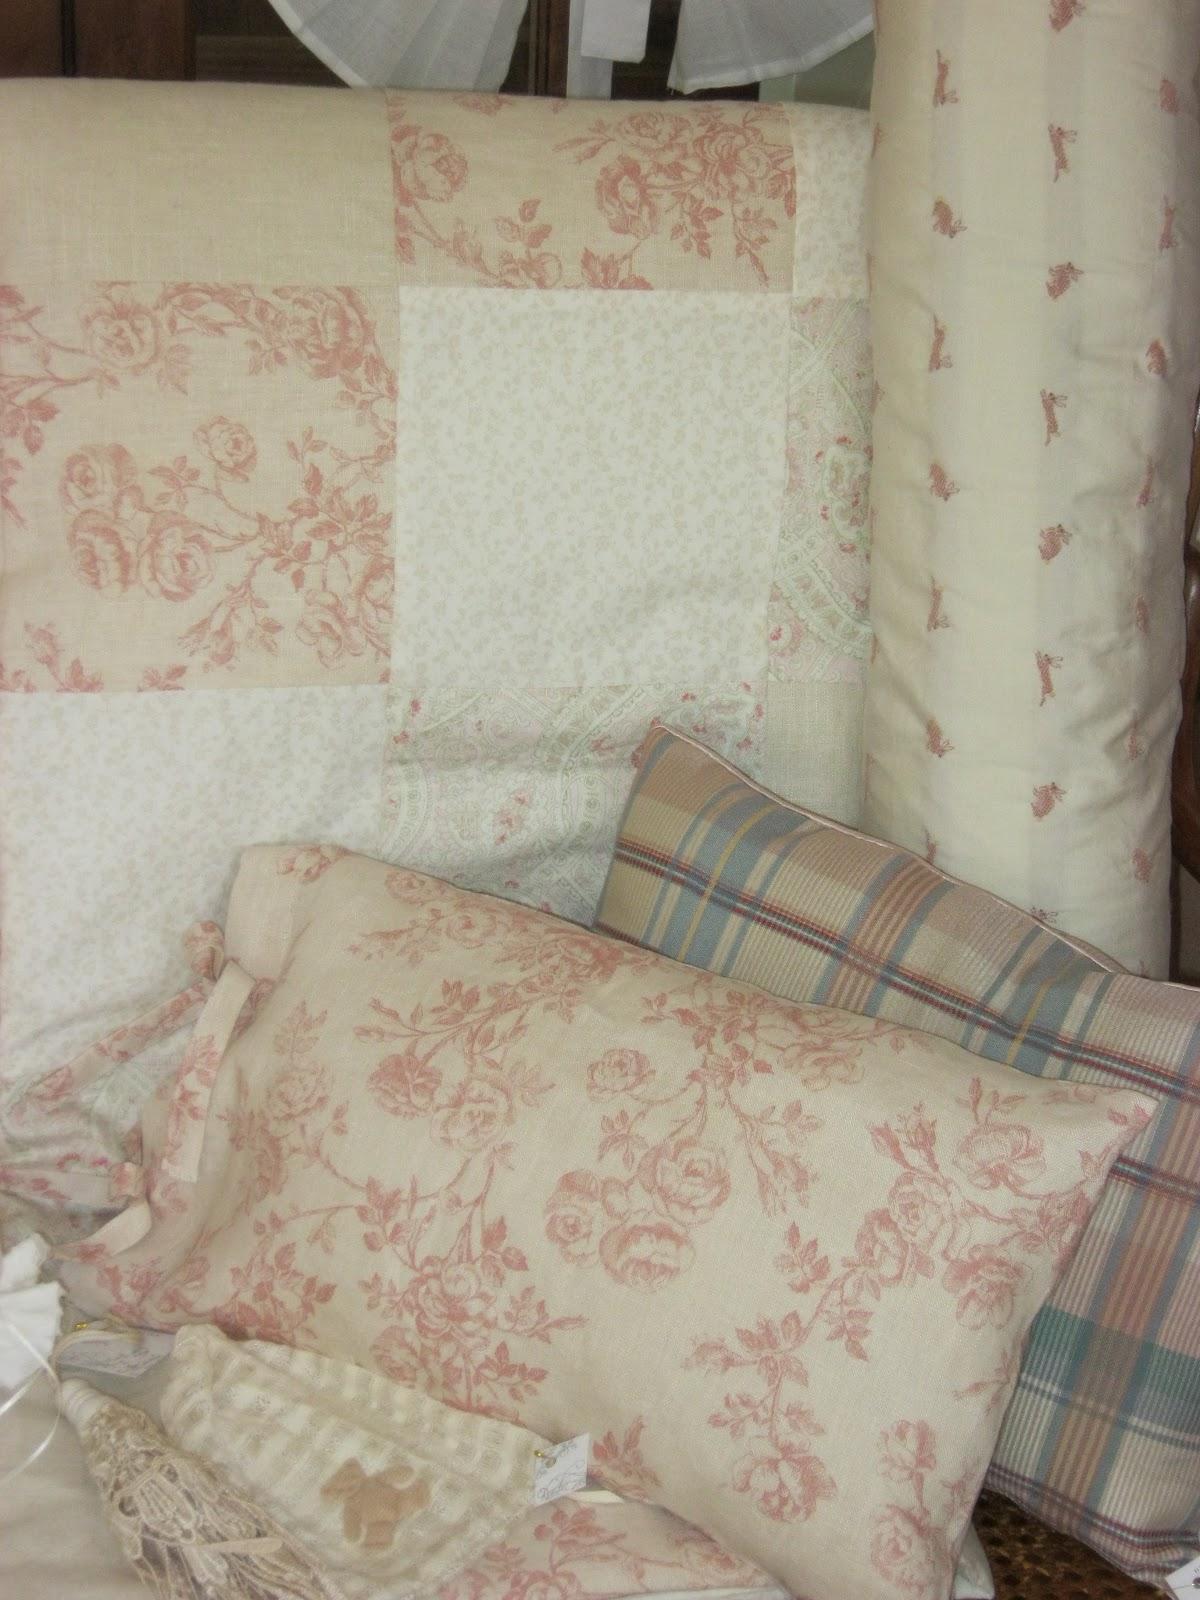 Paz montealegre decoraci n ropa para cuna cubrecamas de cuna protectores s banas de cuna - Protectores para cama cuna ...